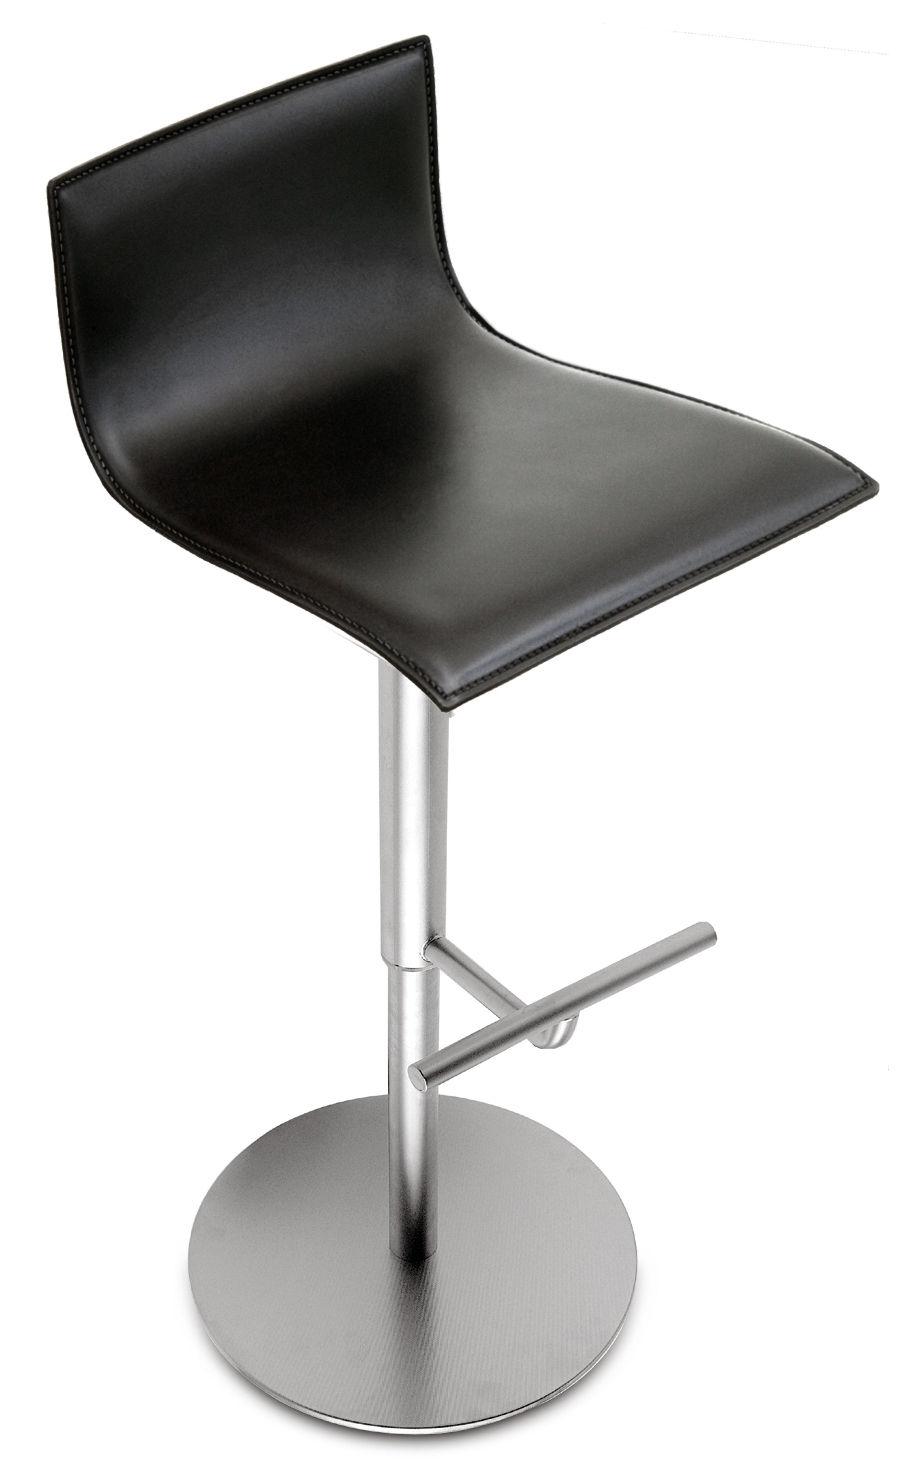 Möbel - Barhocker - Thin Höhenverstellbarer Barhocker - Lapalma - Leder schwarz - Leder, rostfreier Stahl